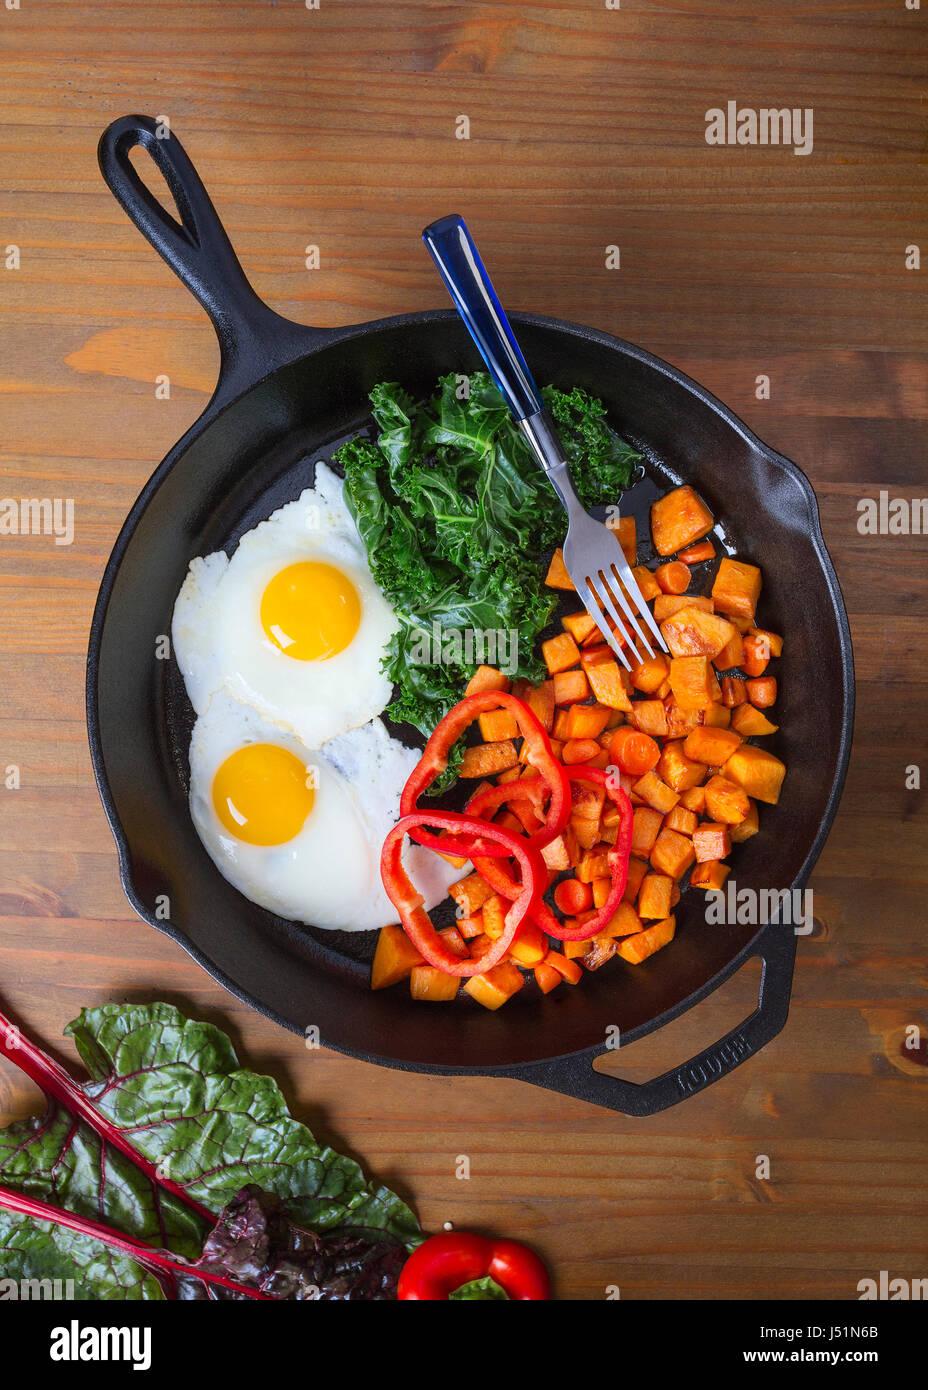 Healthy Breakfast Items Stock Photos Healthy Breakfast Items Stock